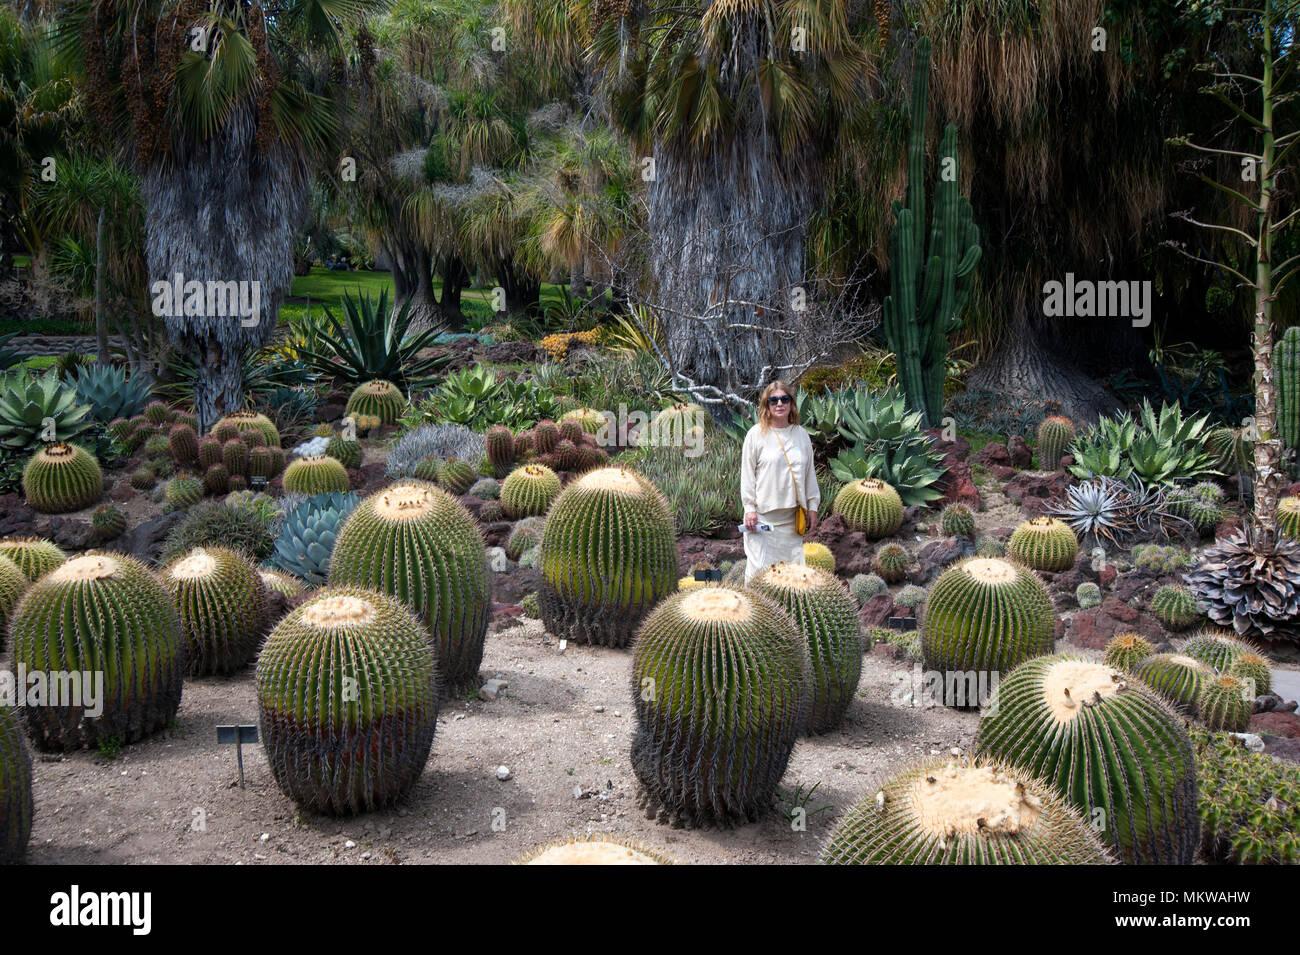 Visitor at the cactus garden in the Huntington Gardens at Pasadena, CA - Stock Image